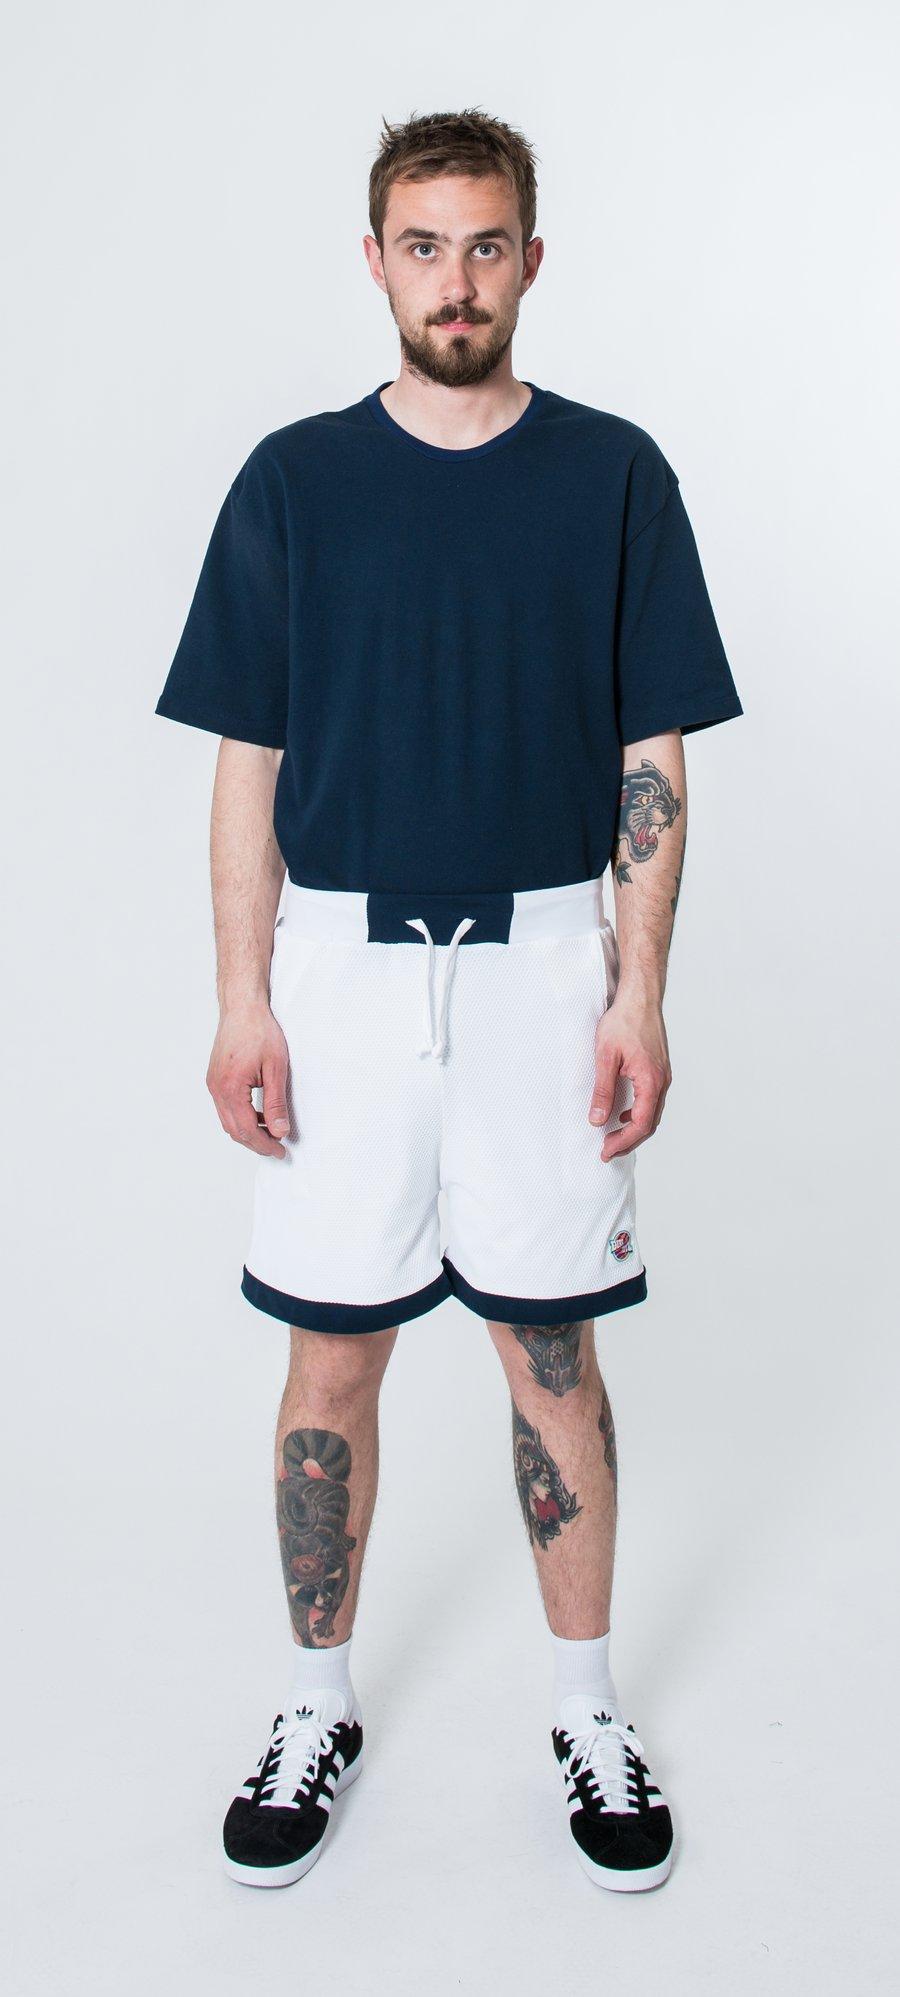 Image of Teamsquad Shorts (white mesh)